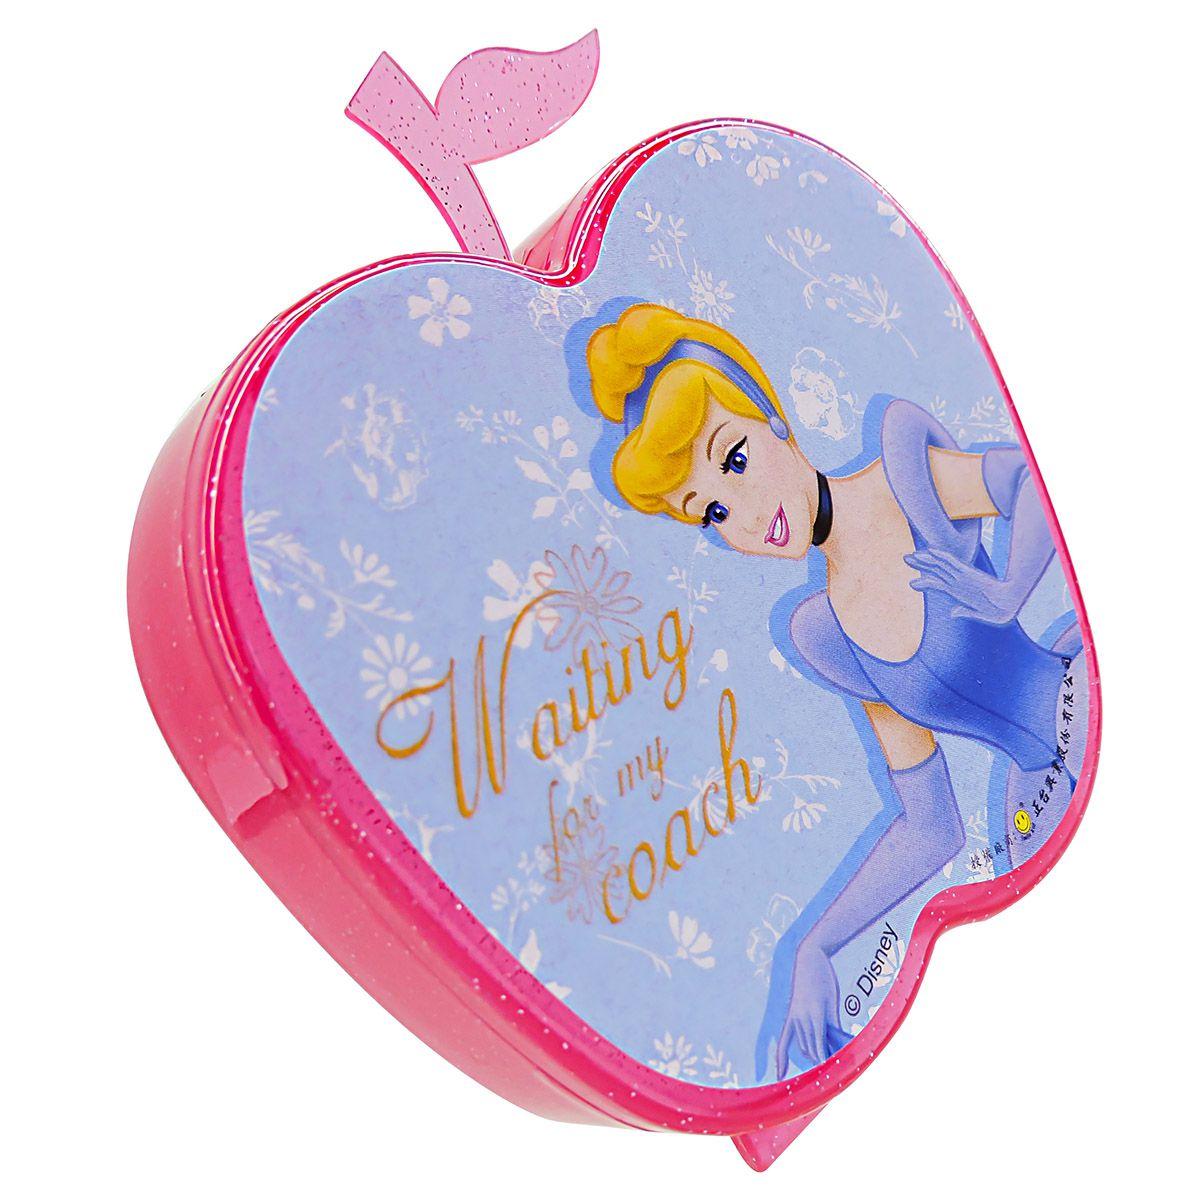 Adesivos Importados Mais Porta Adesivos Princesas 300 Unid